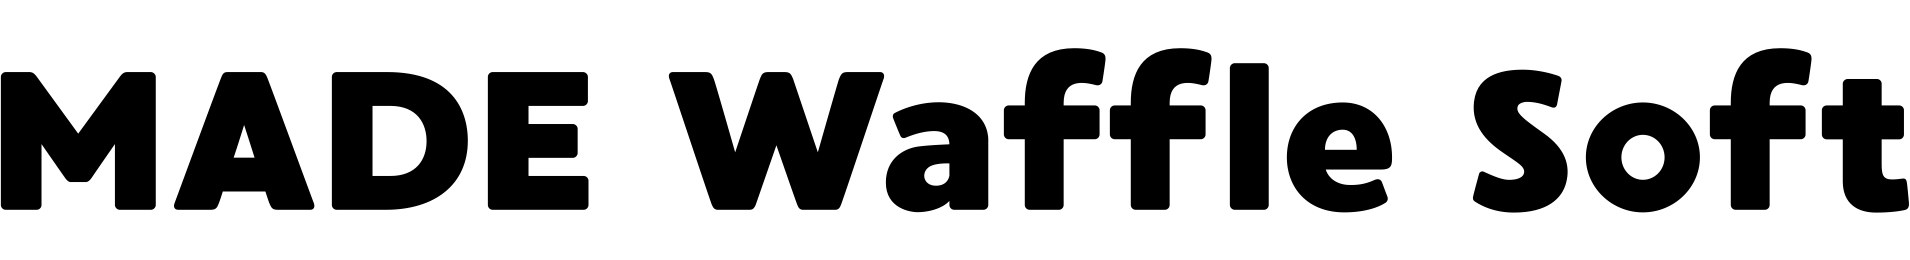 MADE Waffle Soft